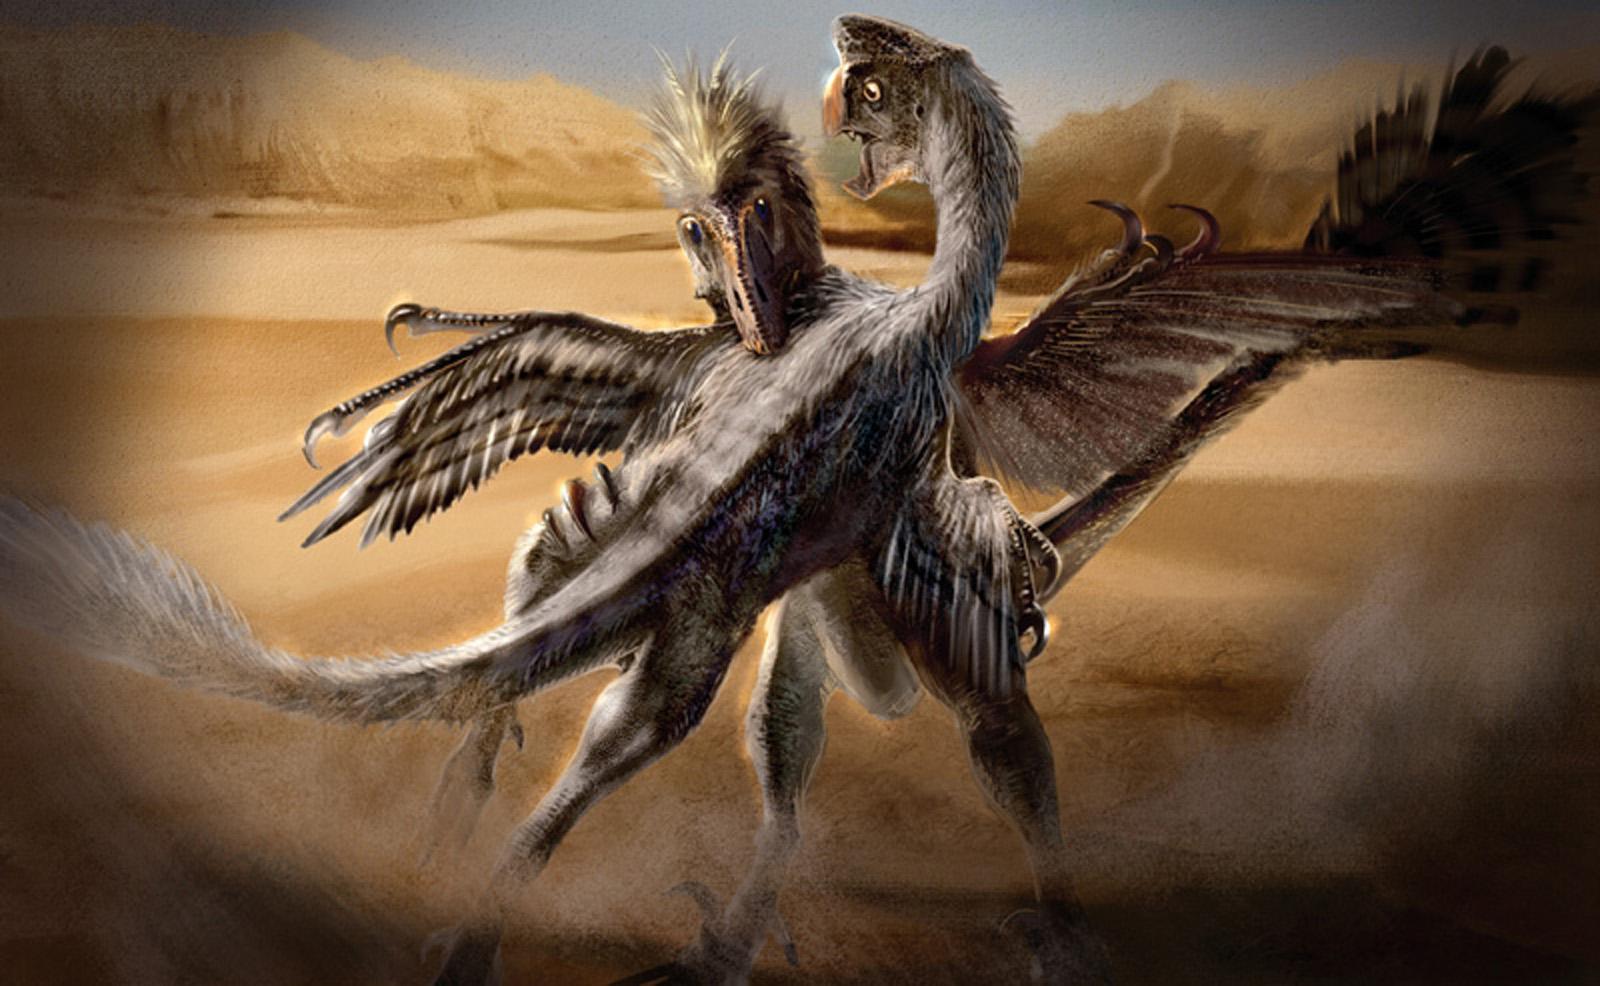 http://dinosaurs.afly.ru/ii/t/oviraptor-i-velociraptor.jpg